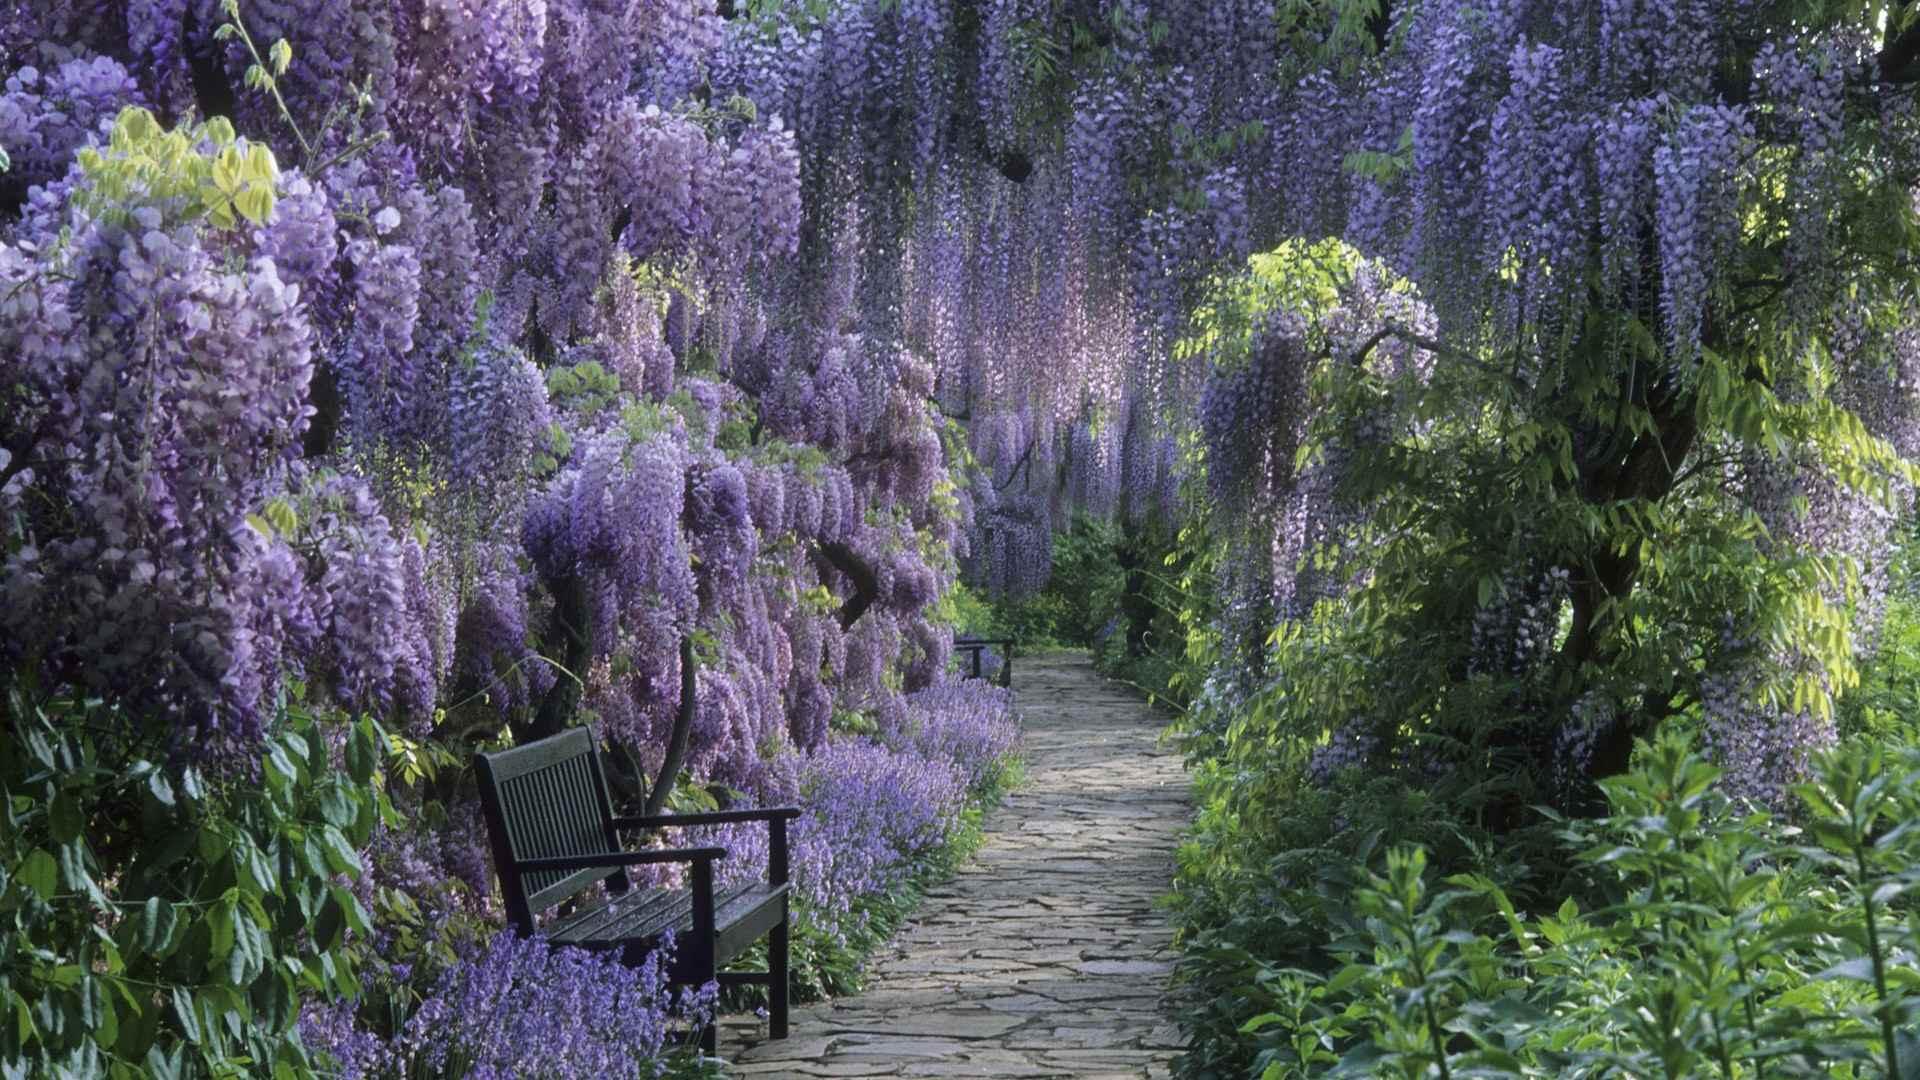 germany-wisteria_00267451-1light1.jpg